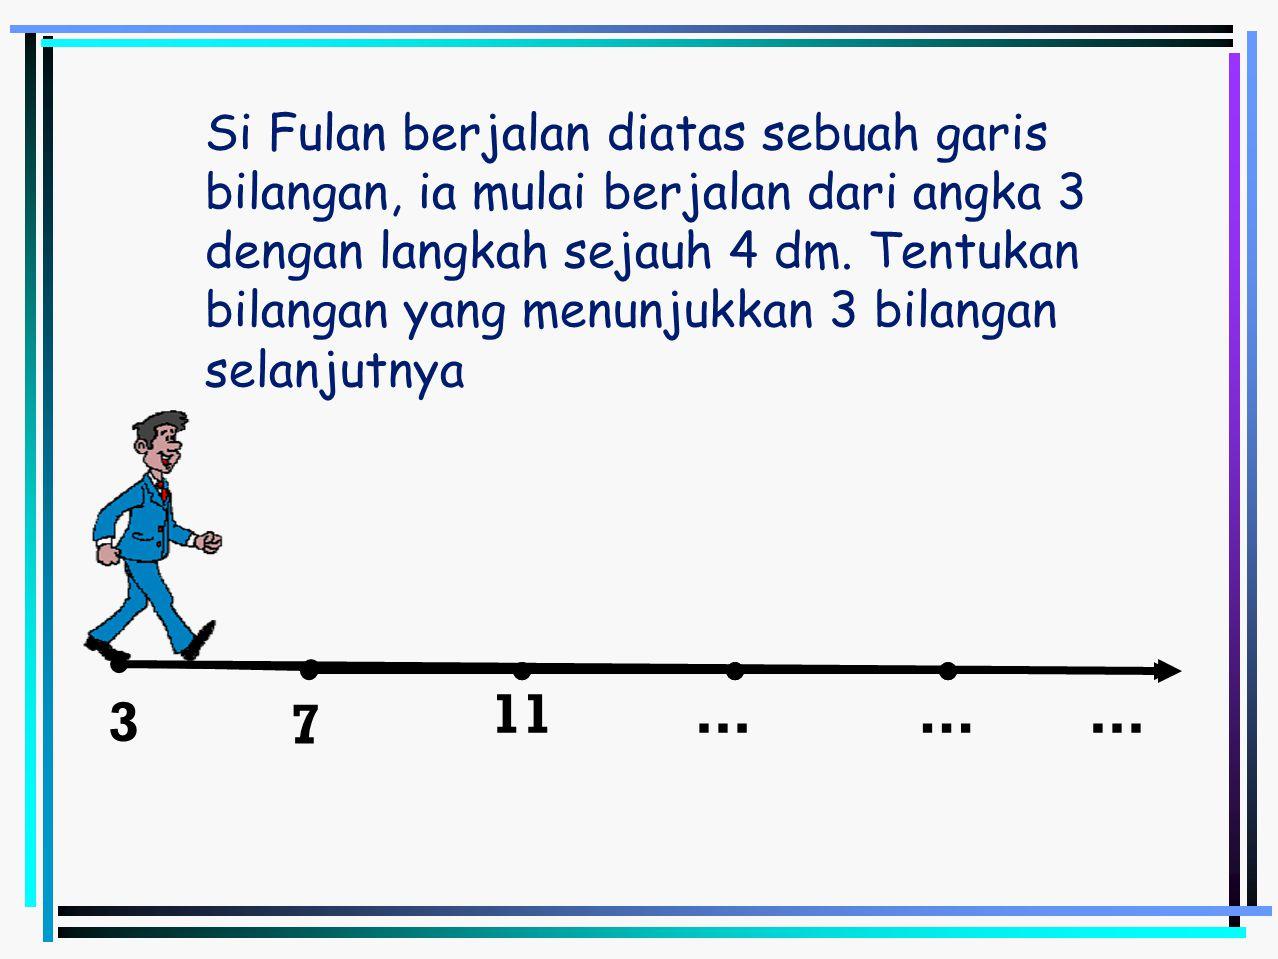 Si Fulan berjalan diatas sebuah garis bilangan, ia mulai berjalan dari angka 3 dengan langkah sejauh 4 dm. Tentukan bilangan yang menunjukkan 3 bilangan selanjutnya